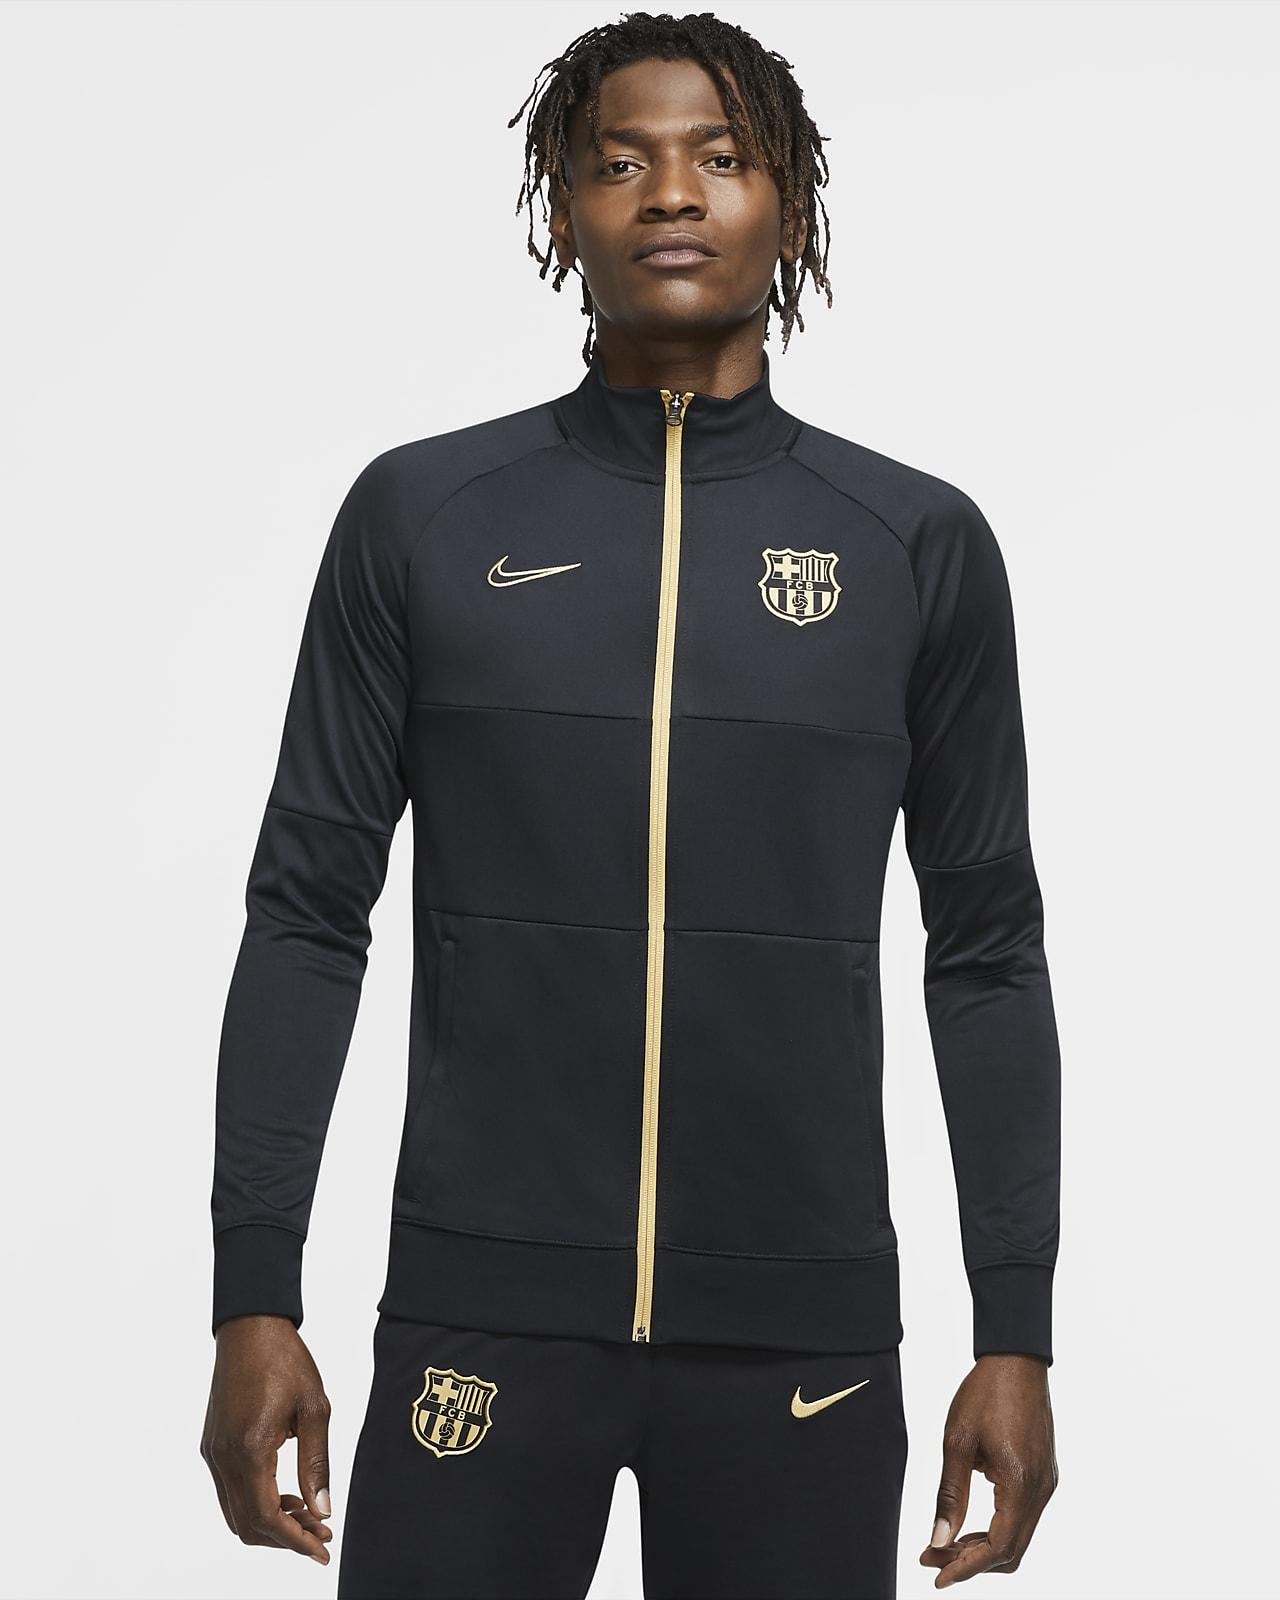 F.C. Barcelona Men's Football Track Jacket